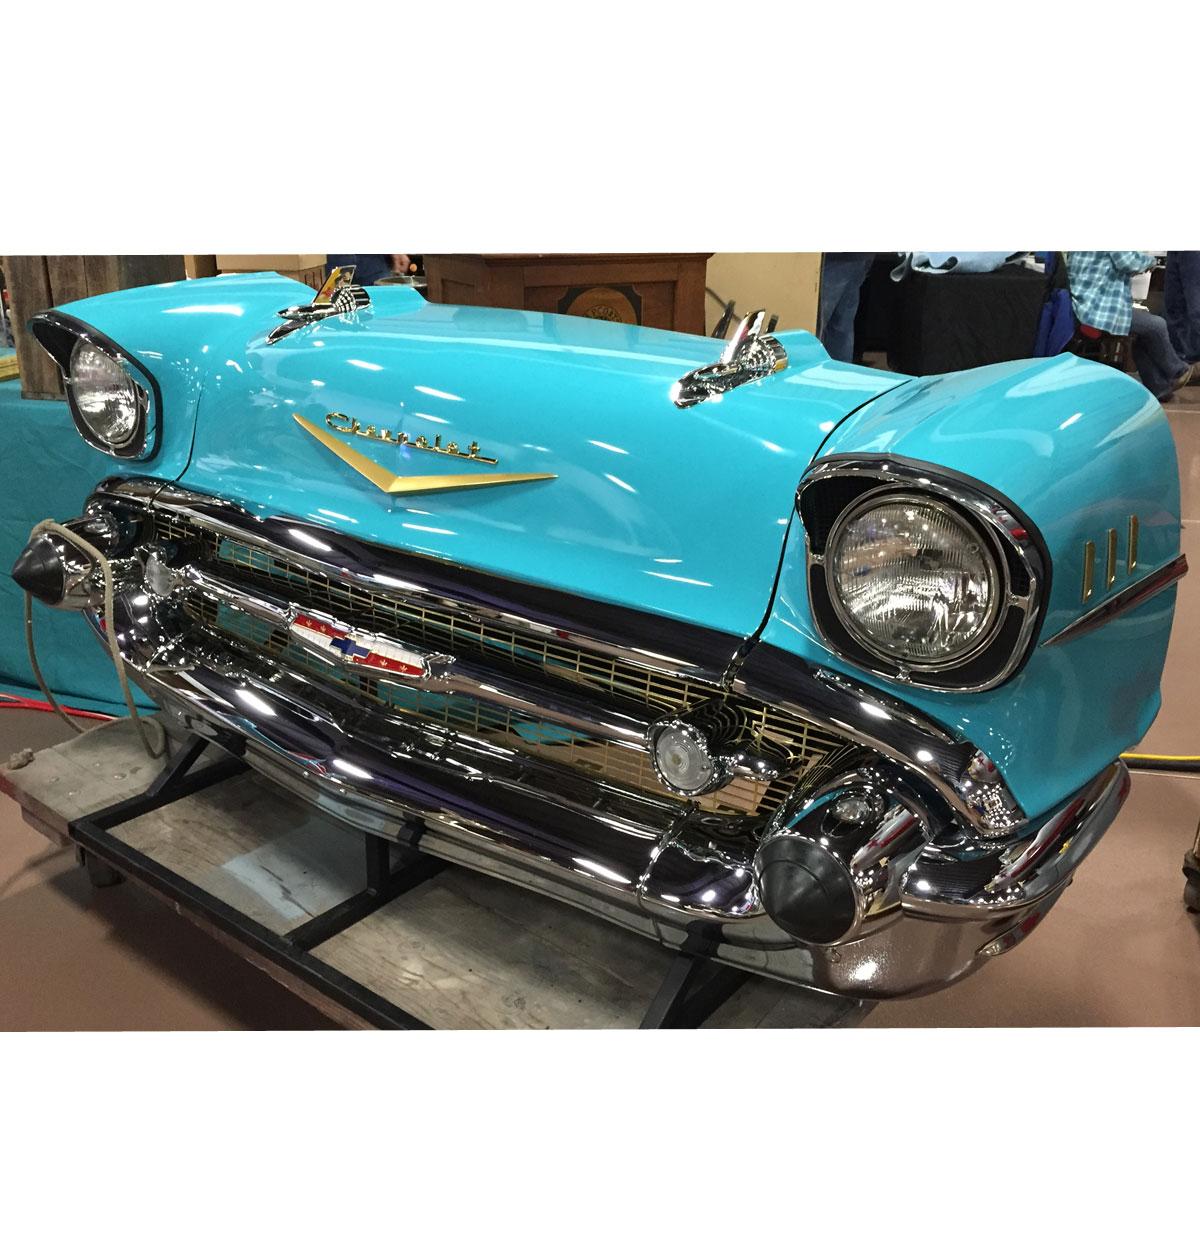 Originele 1957 Chevrolet Carfront Decoratie Turquoise